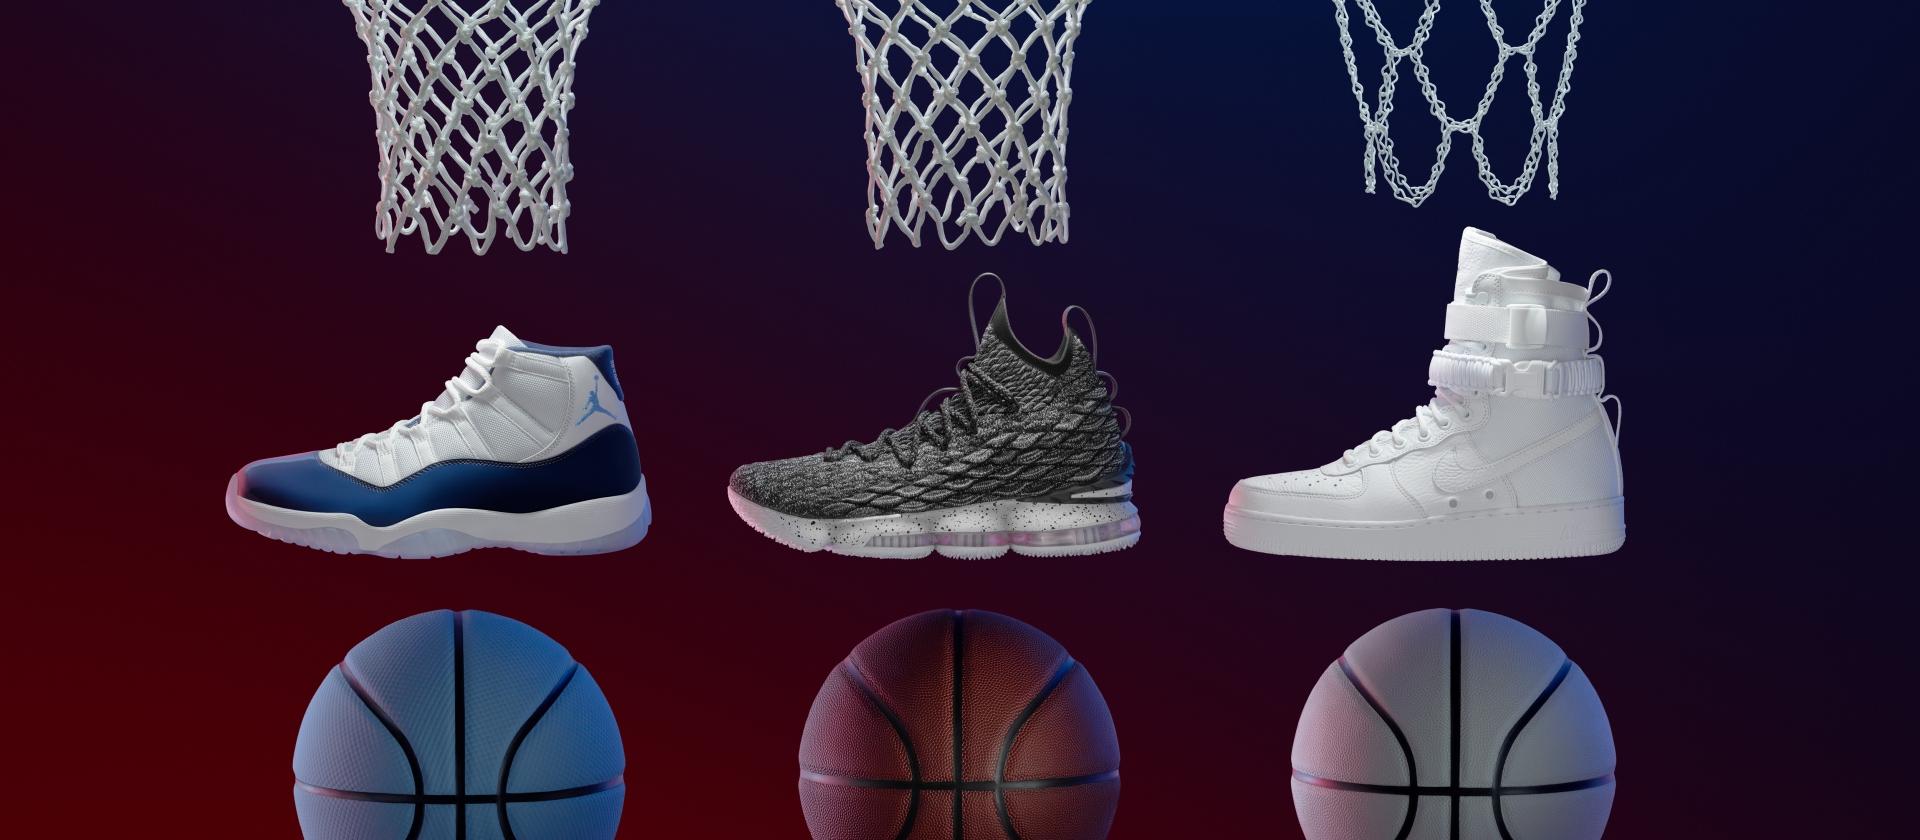 S A R A H - J A N E   H O F F M A N N Nike China 11:11 Campaign 2017